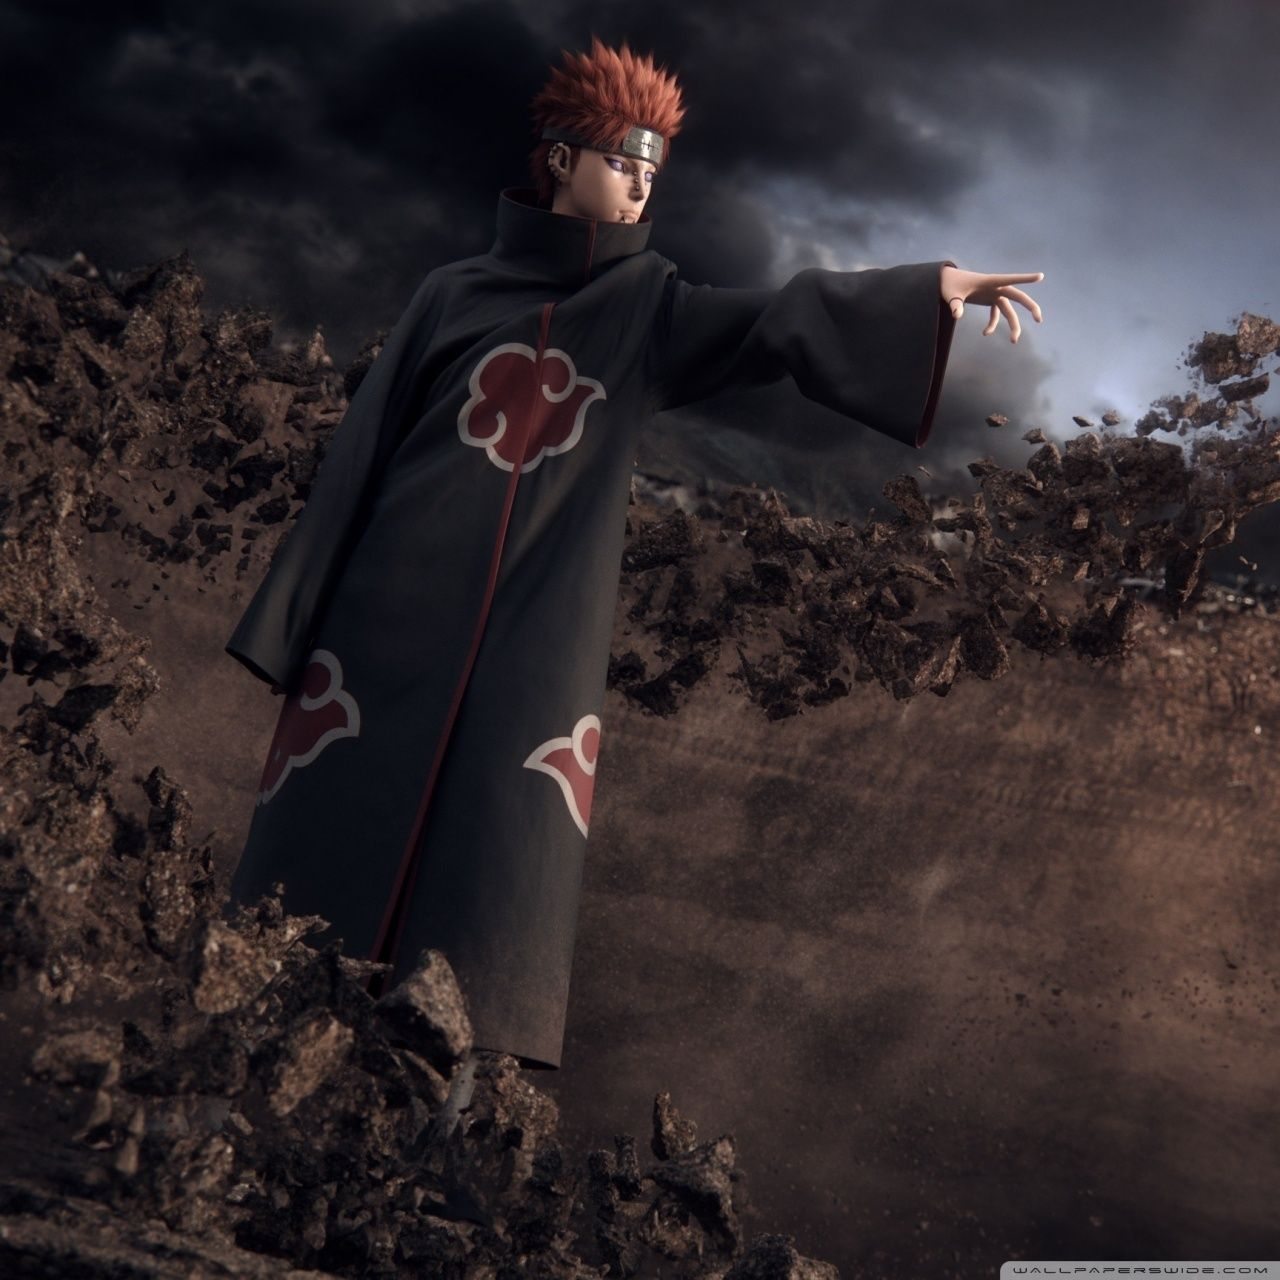 Naruto Shinra Tensei 4k Hd Desktop Wallpaper For 4k Ultra Hd Tv Wallpaper Naruto Gambar Kehidupan Gambar Anime